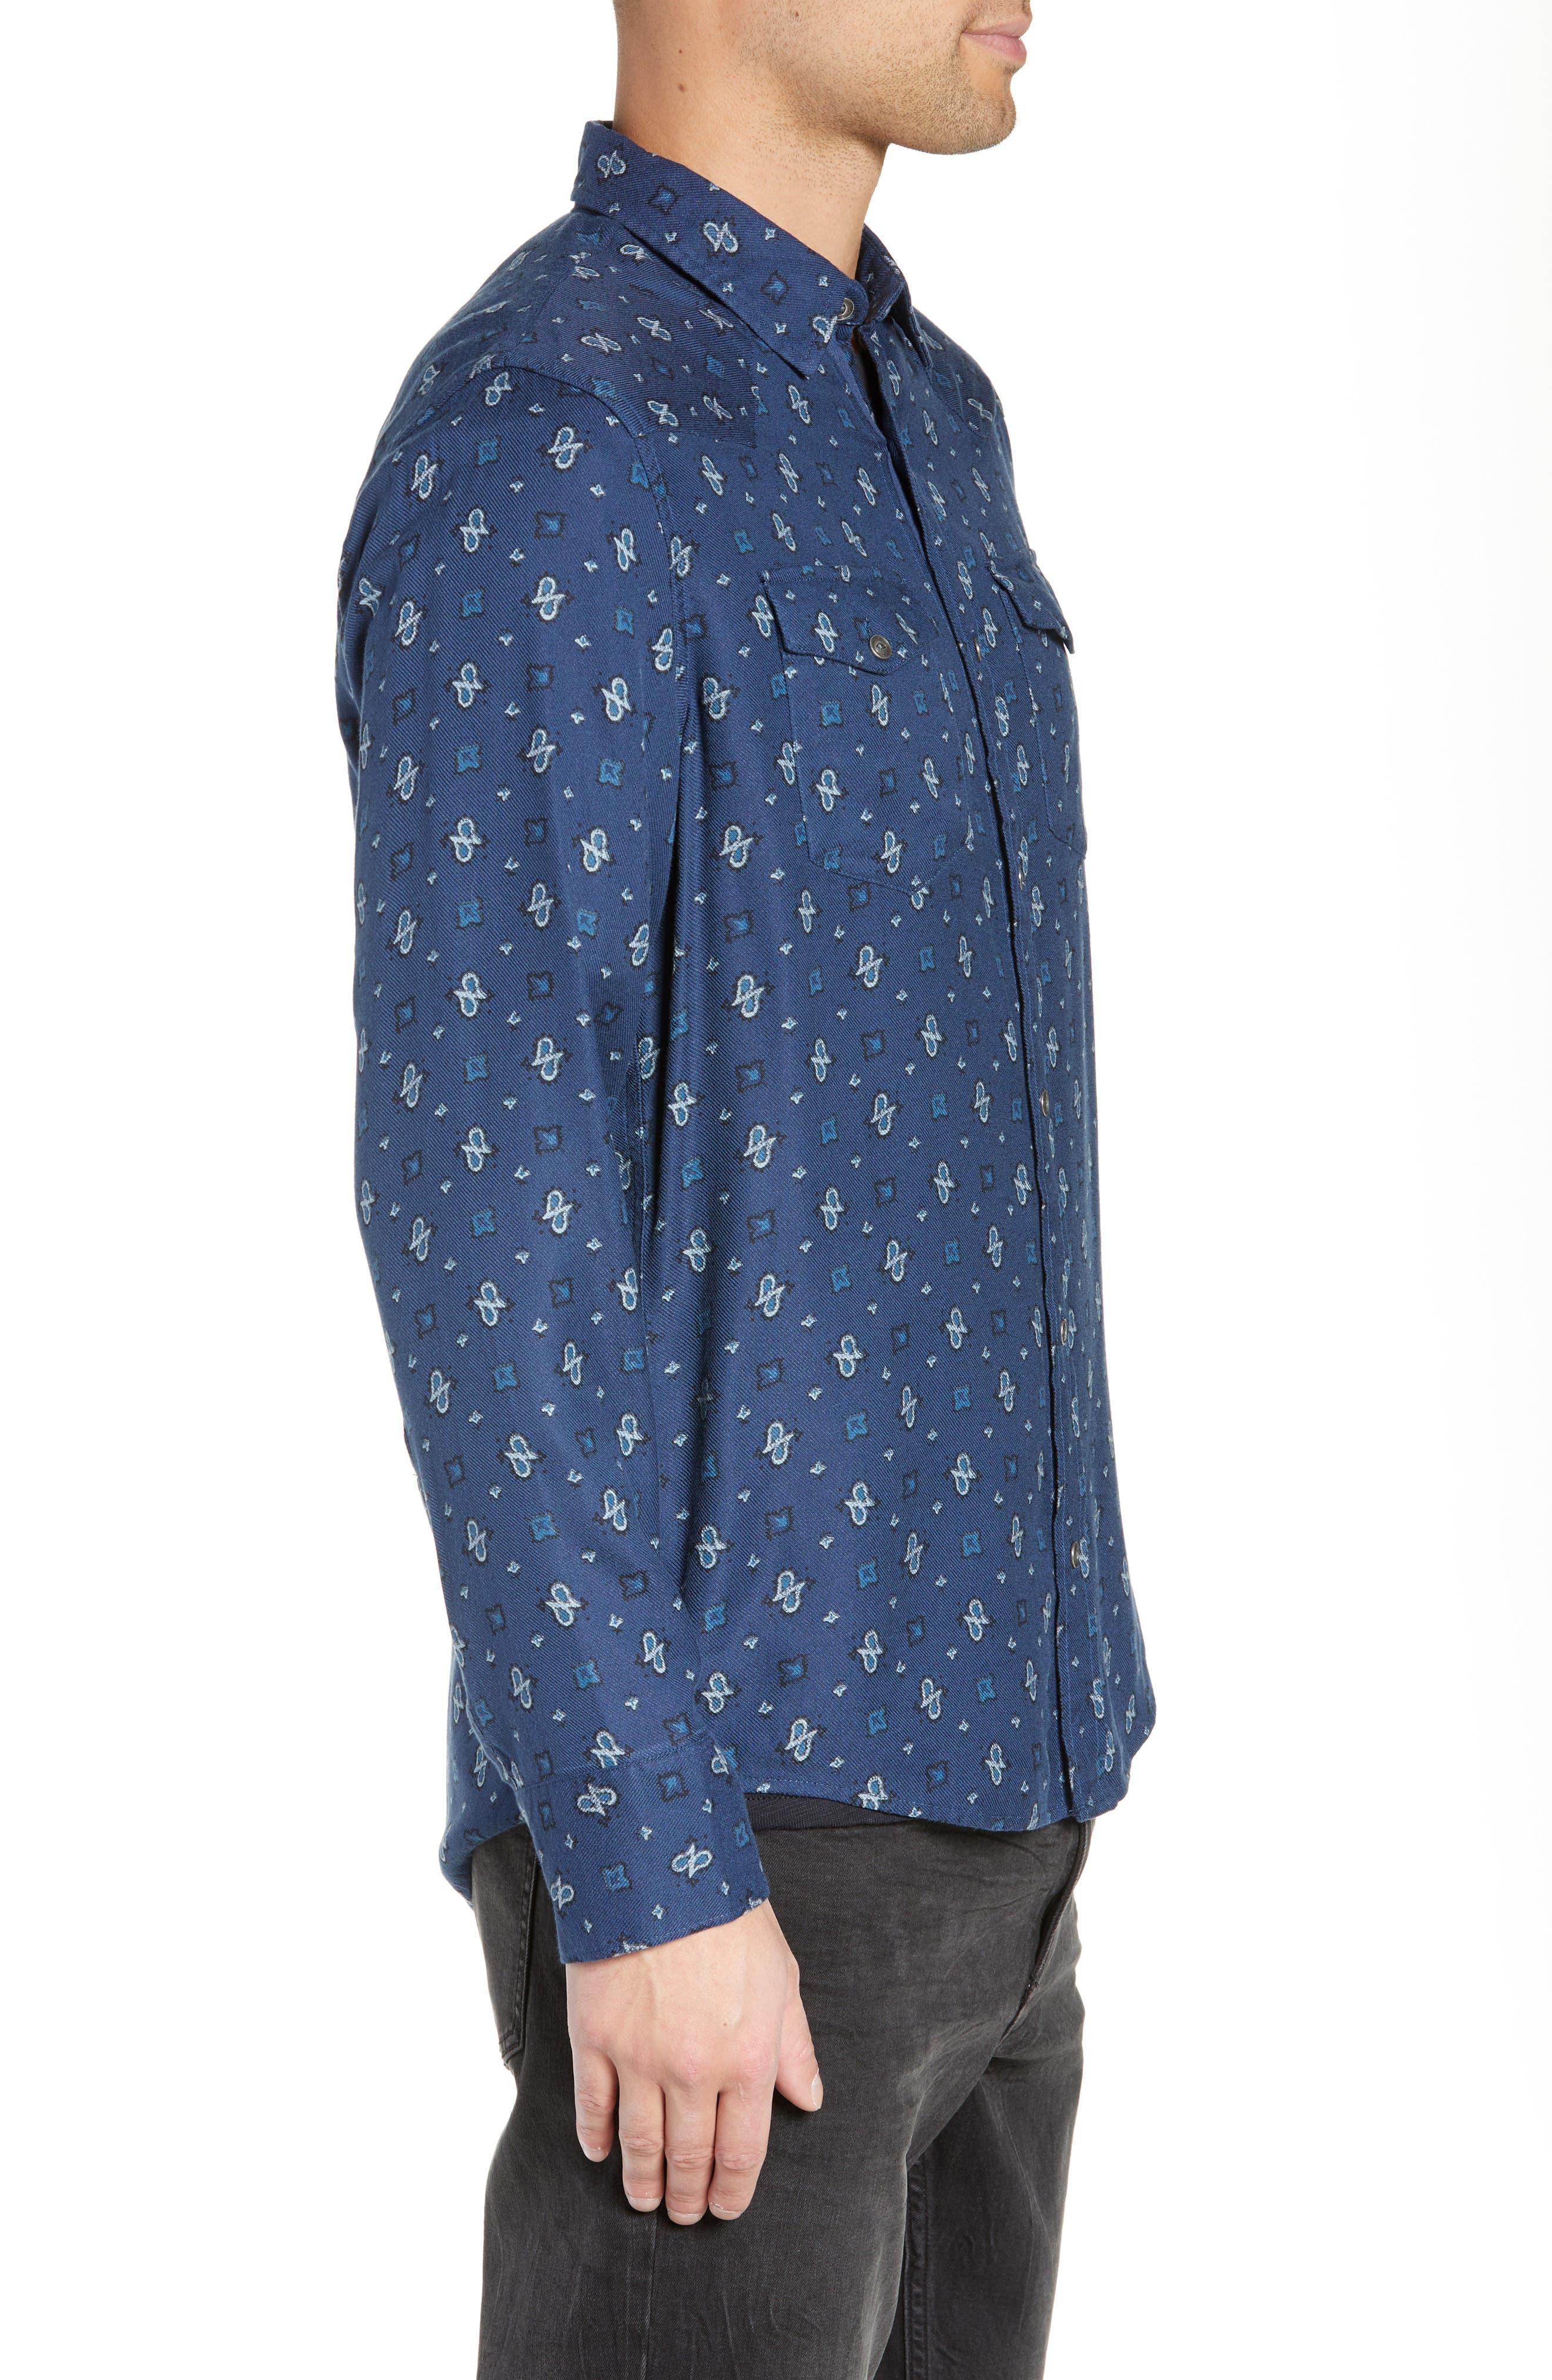 Regular Fit Paisley Western Shirt,                             Alternate thumbnail 4, color,                             BLUE CASPIA DESERT PAISLEY